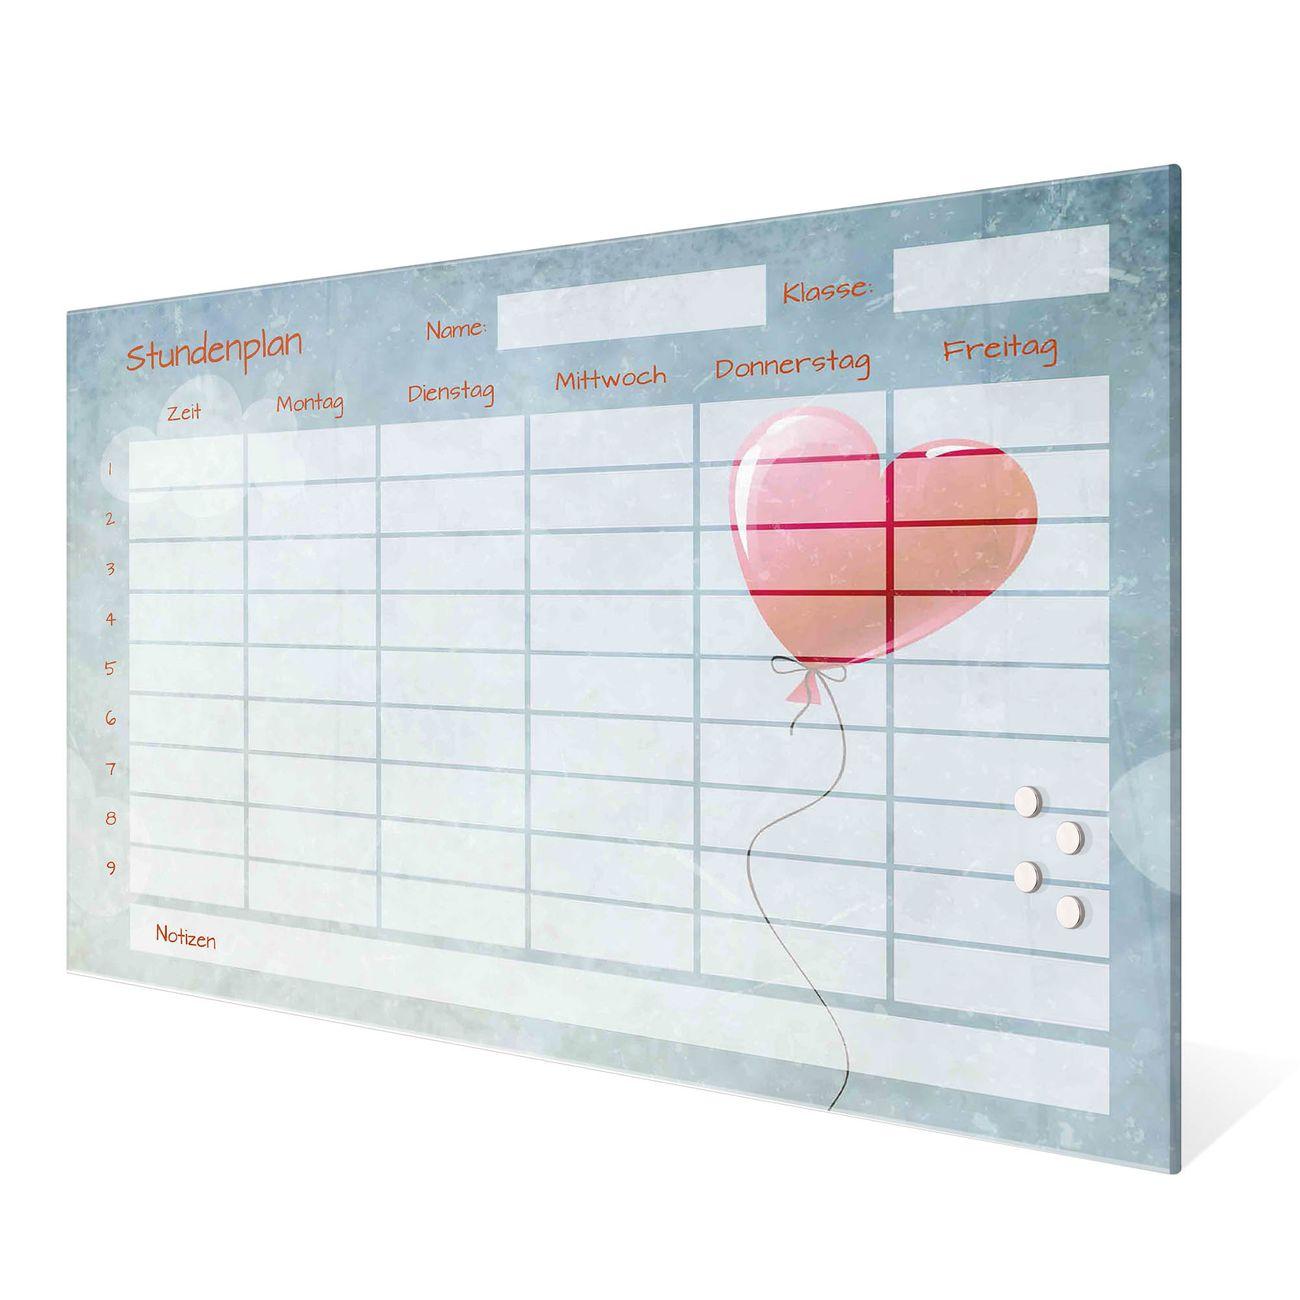 Stundenplan aus Glas Motiv Herzballon – Bild 1